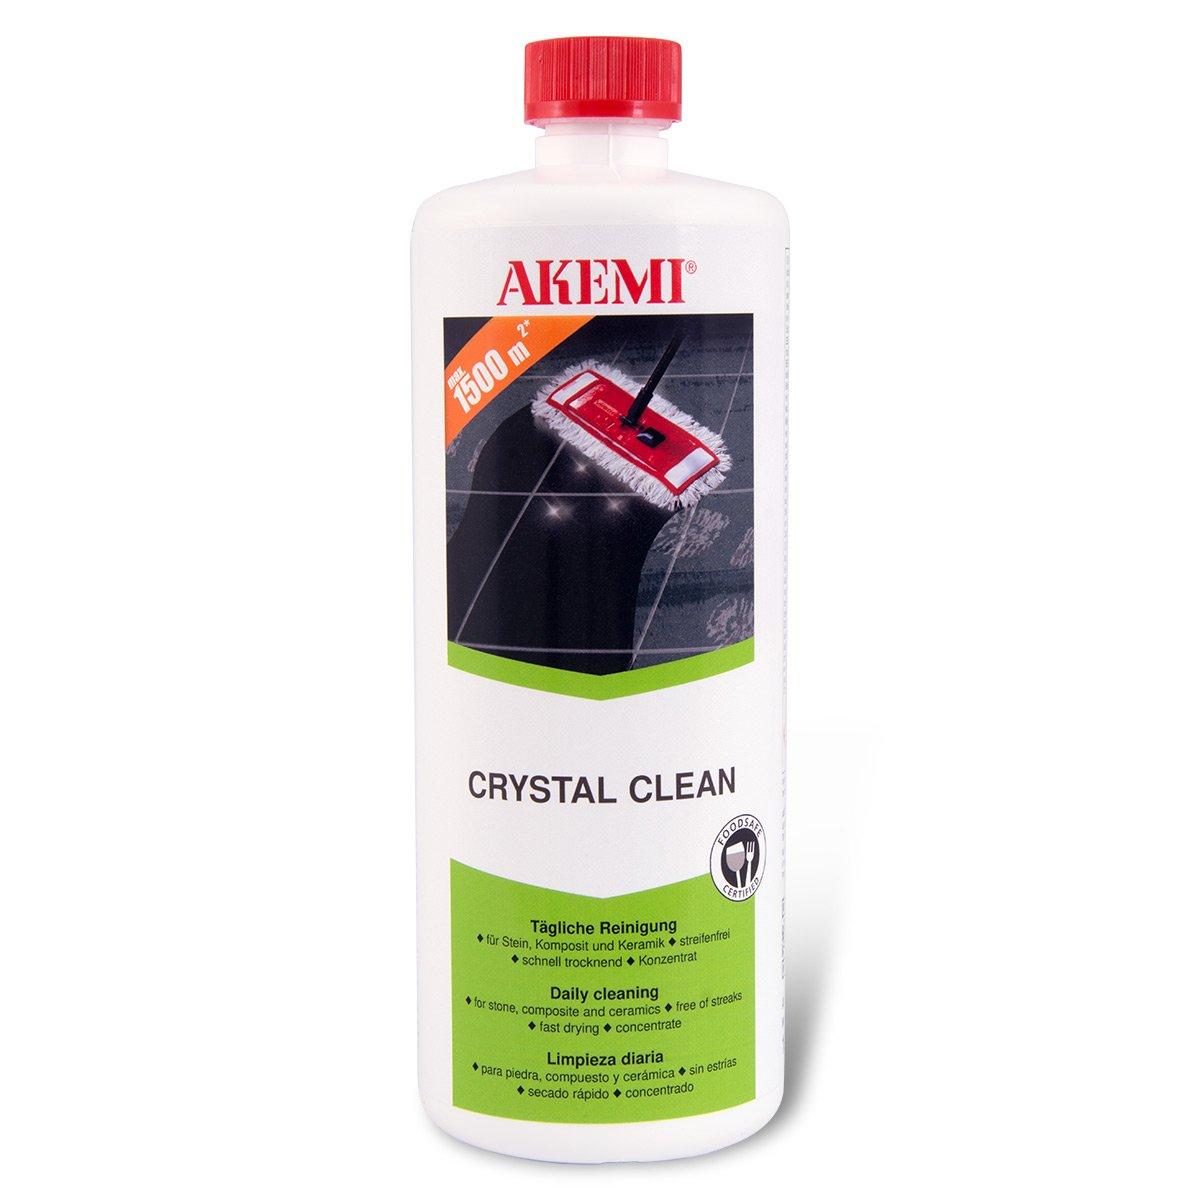 AKEMI CRYSTAL CLEANER 1 LITRE